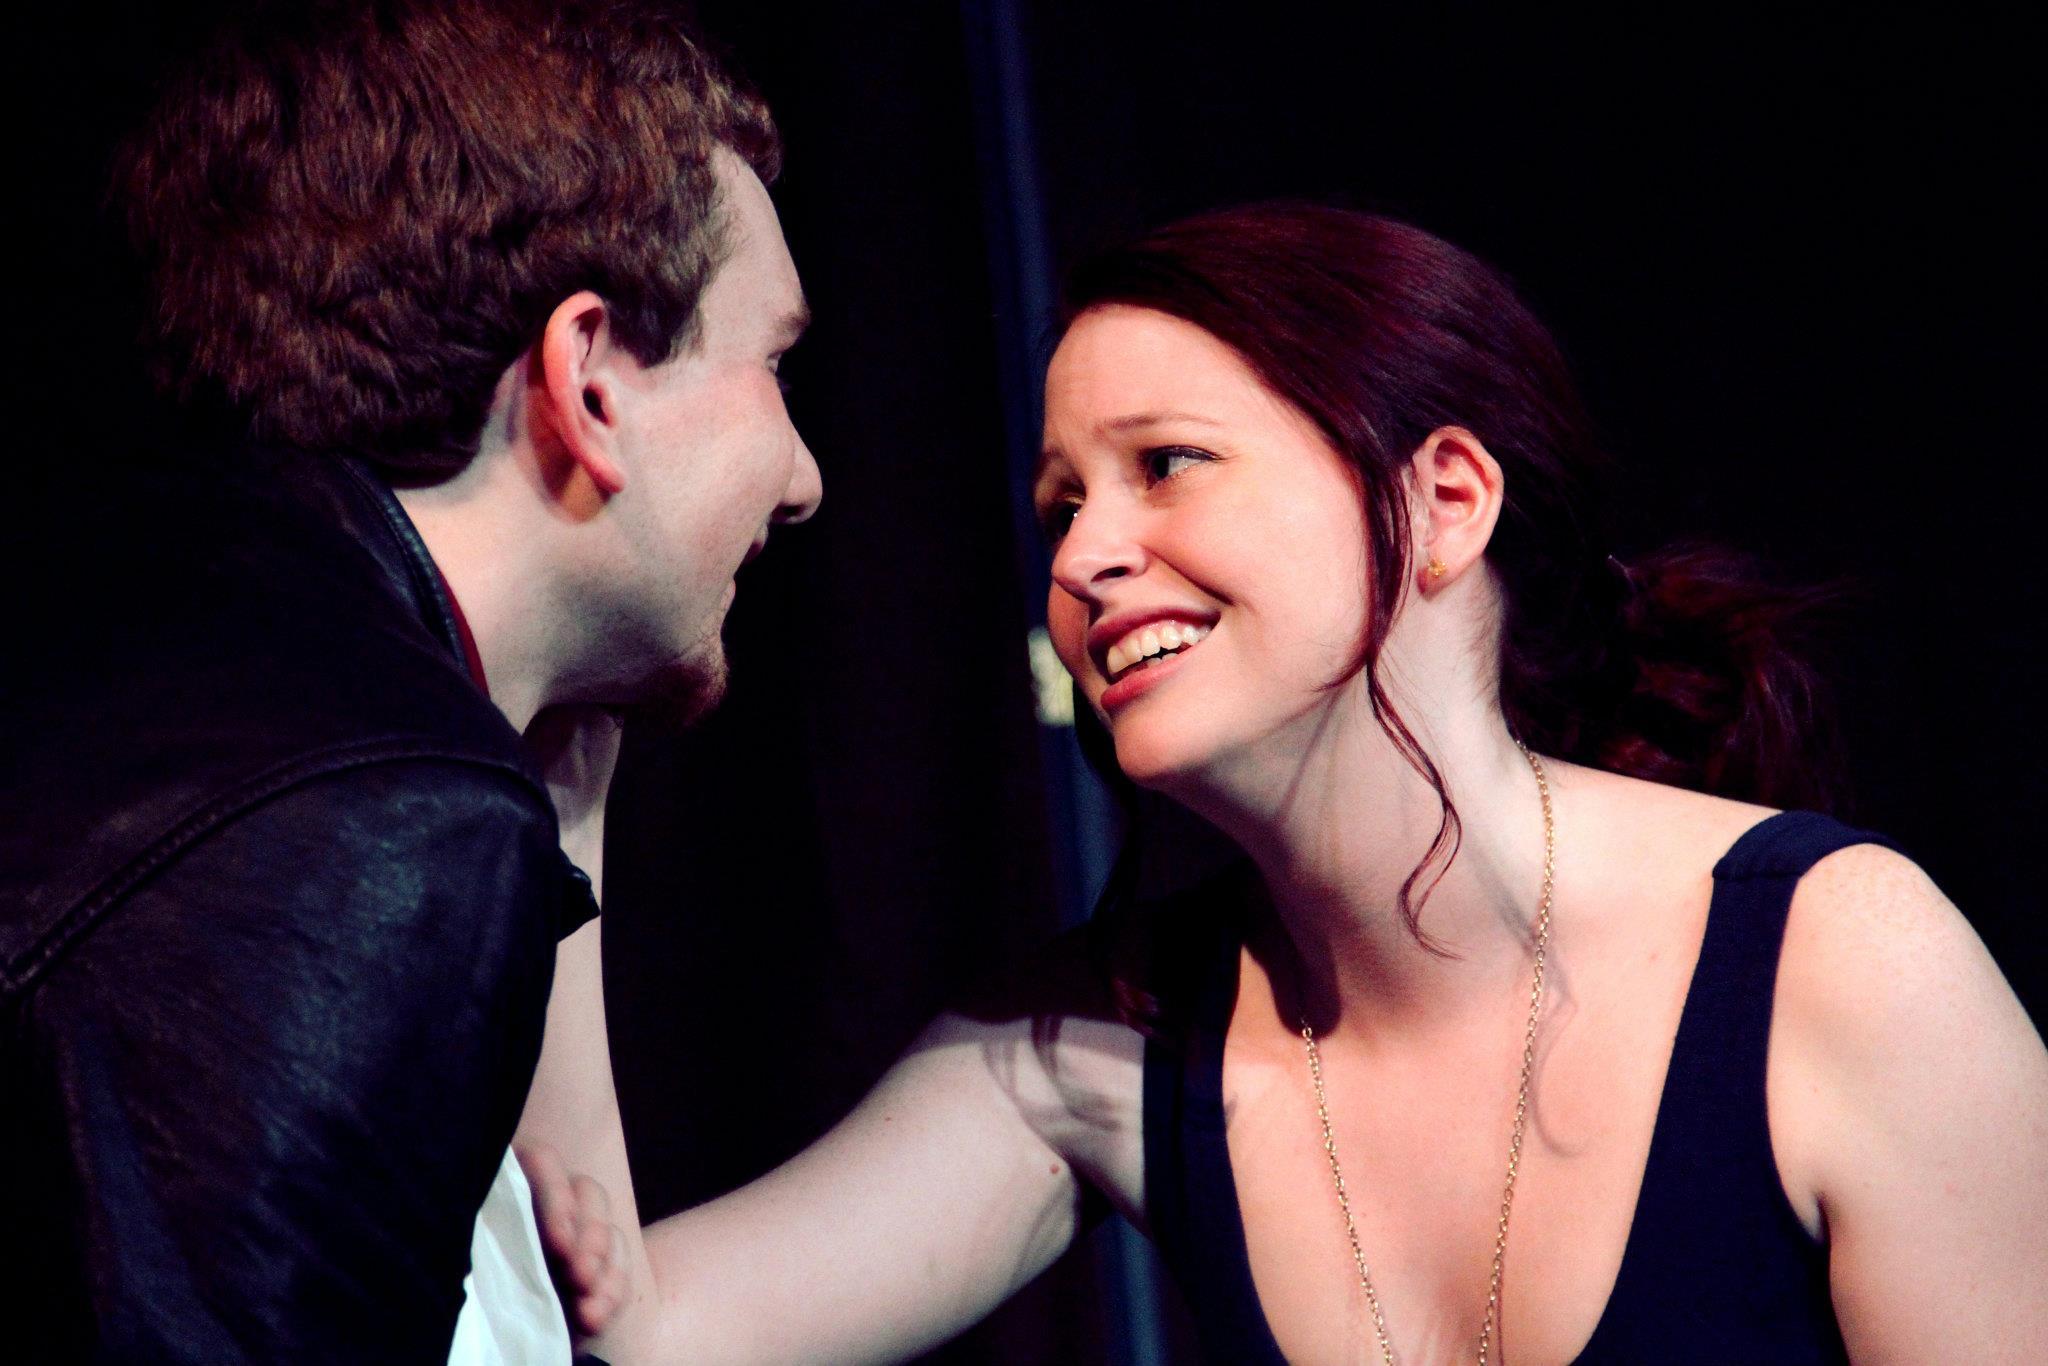 Troilus (Alex Karge) and Cressida (Haley Cooper)